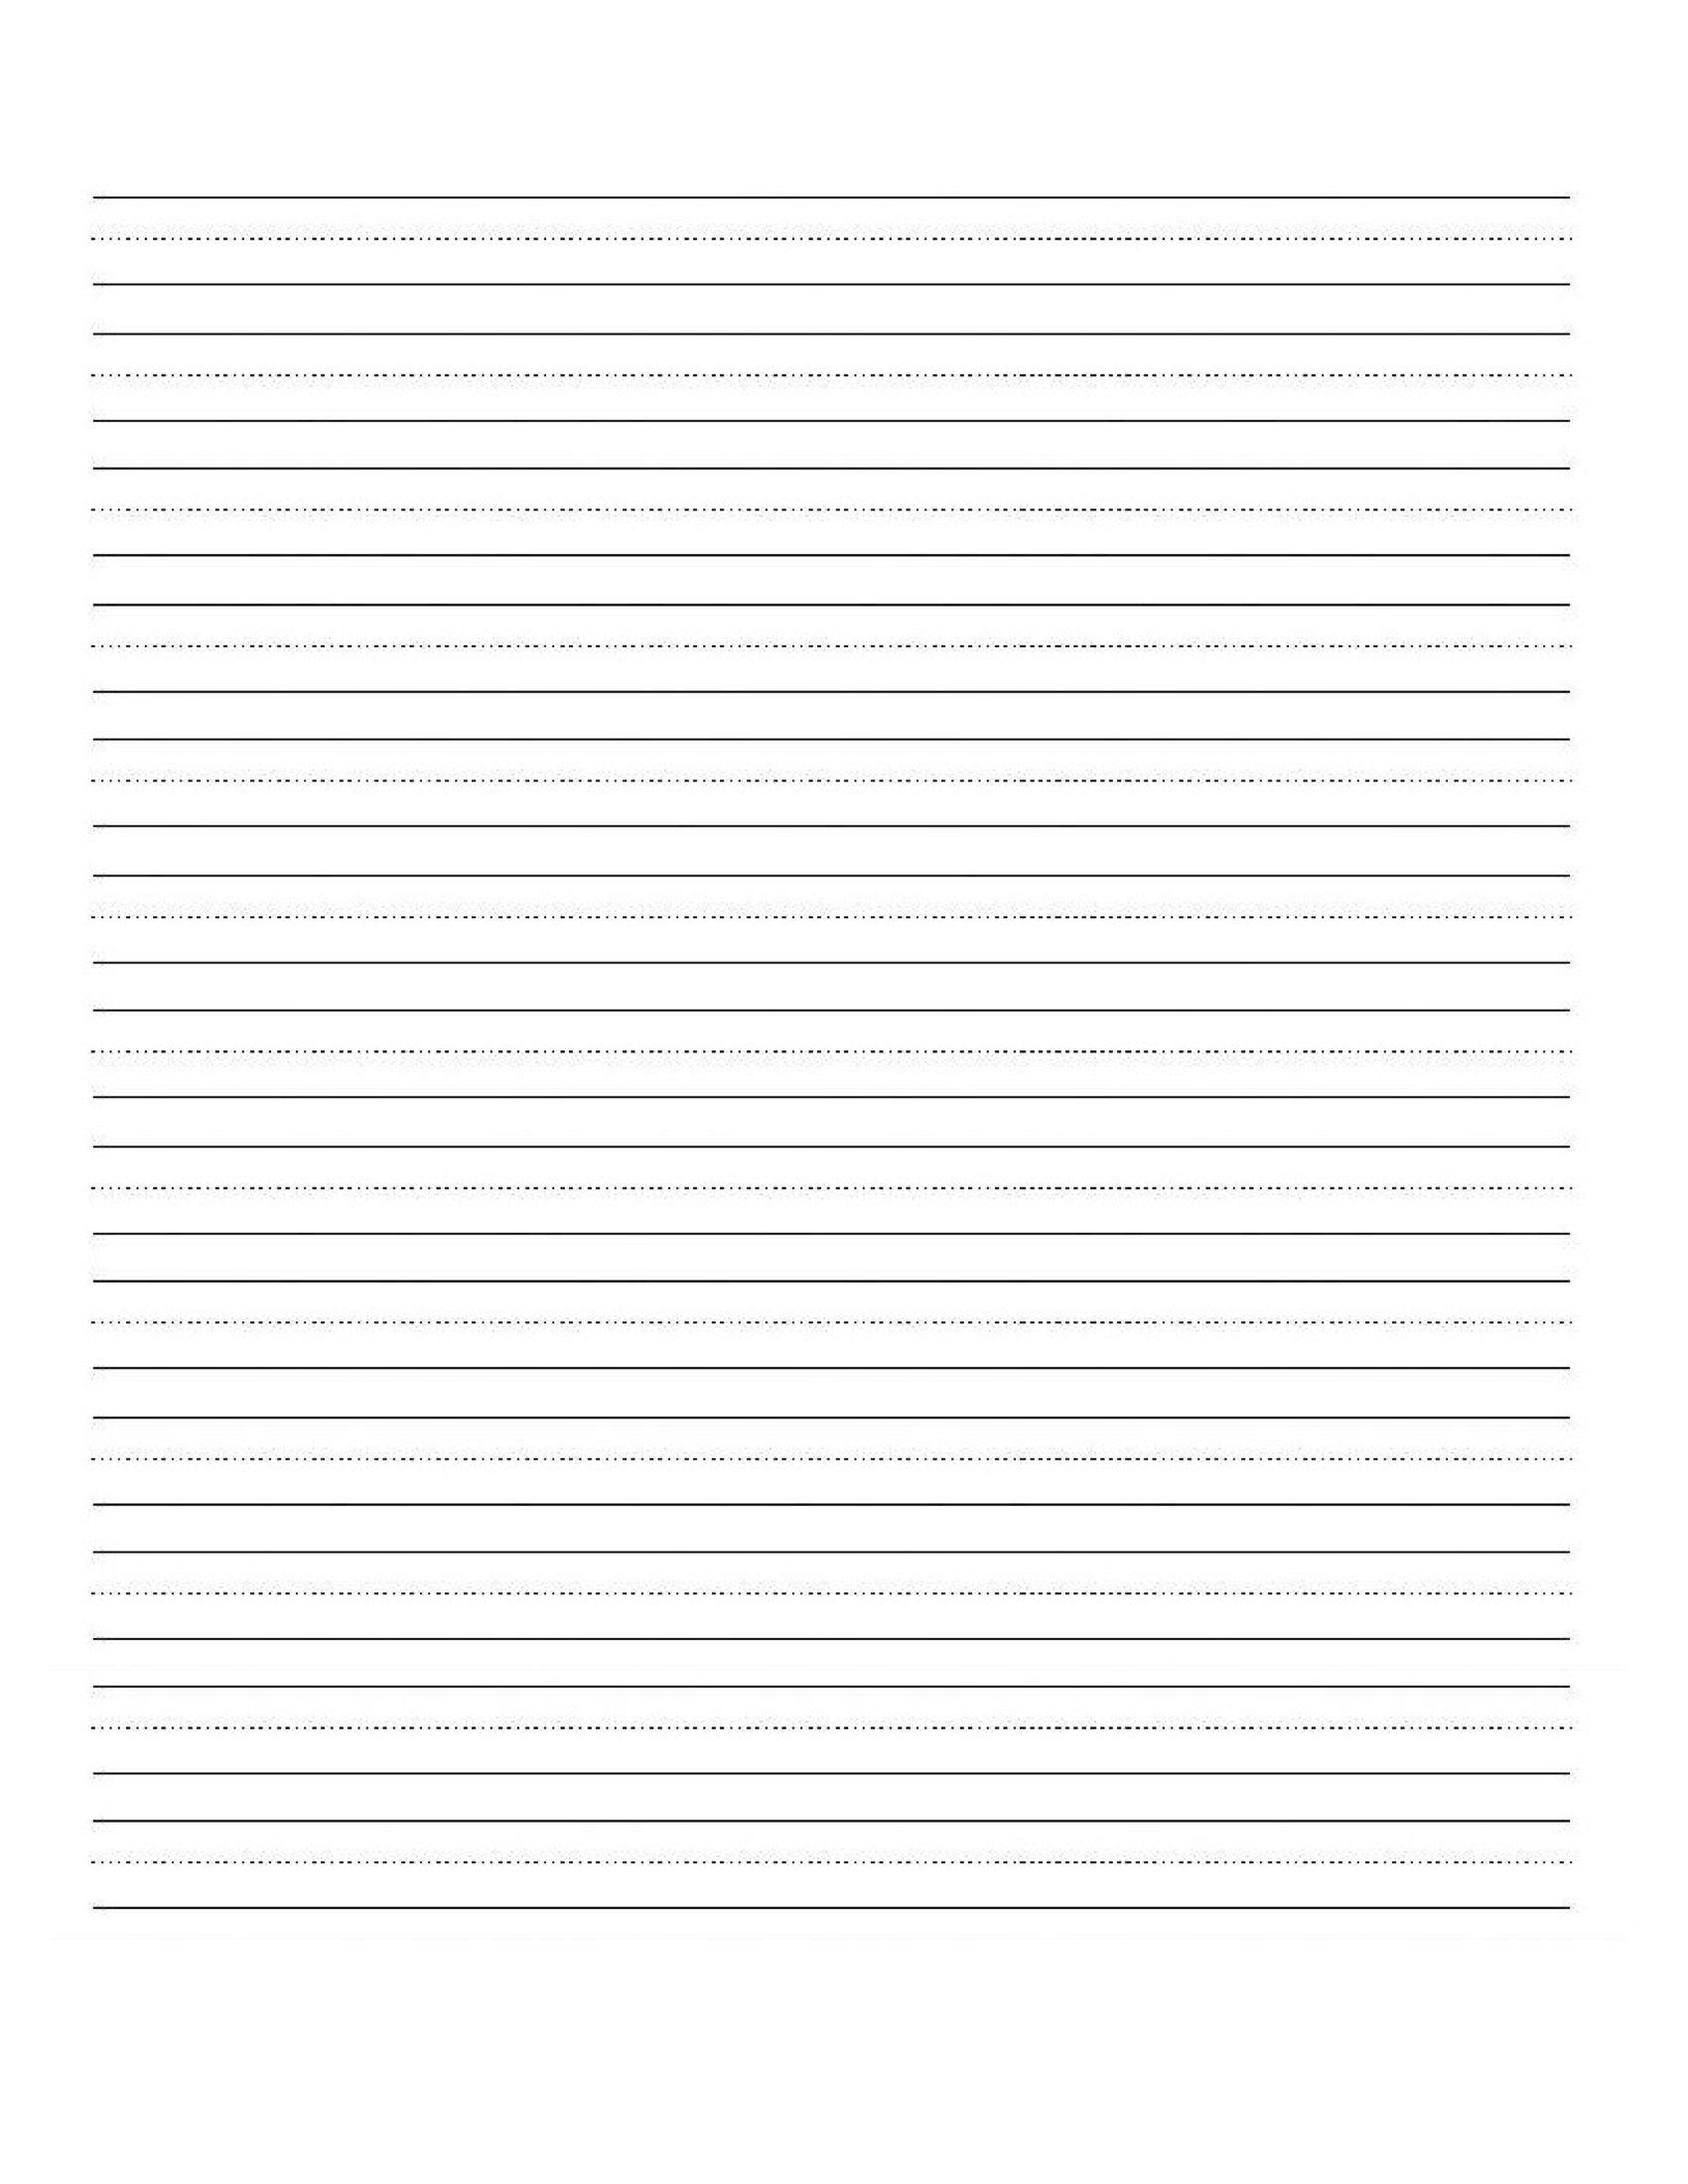 Cursive Writing Worksheets Free Alphabet Cursive Writing Worksheets - Free Printable Writing Sheets